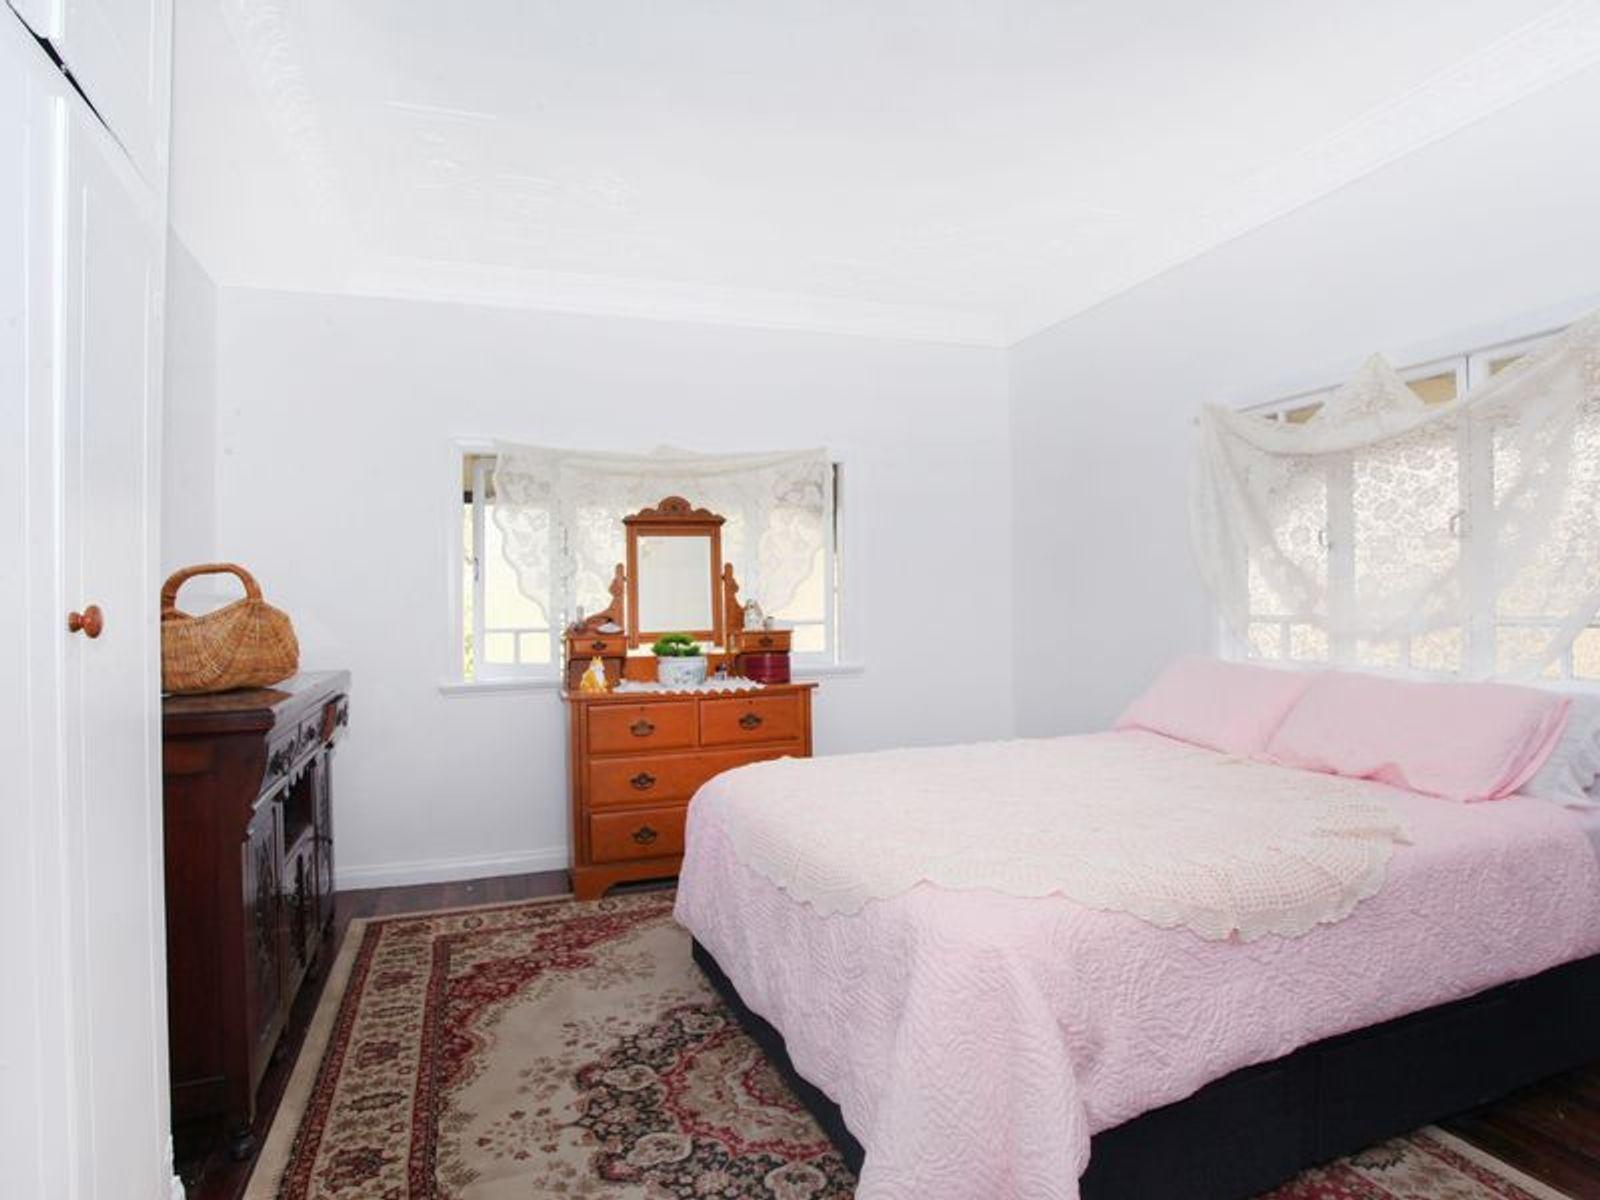 40 Rigby Street, Nambour, QLD 4560